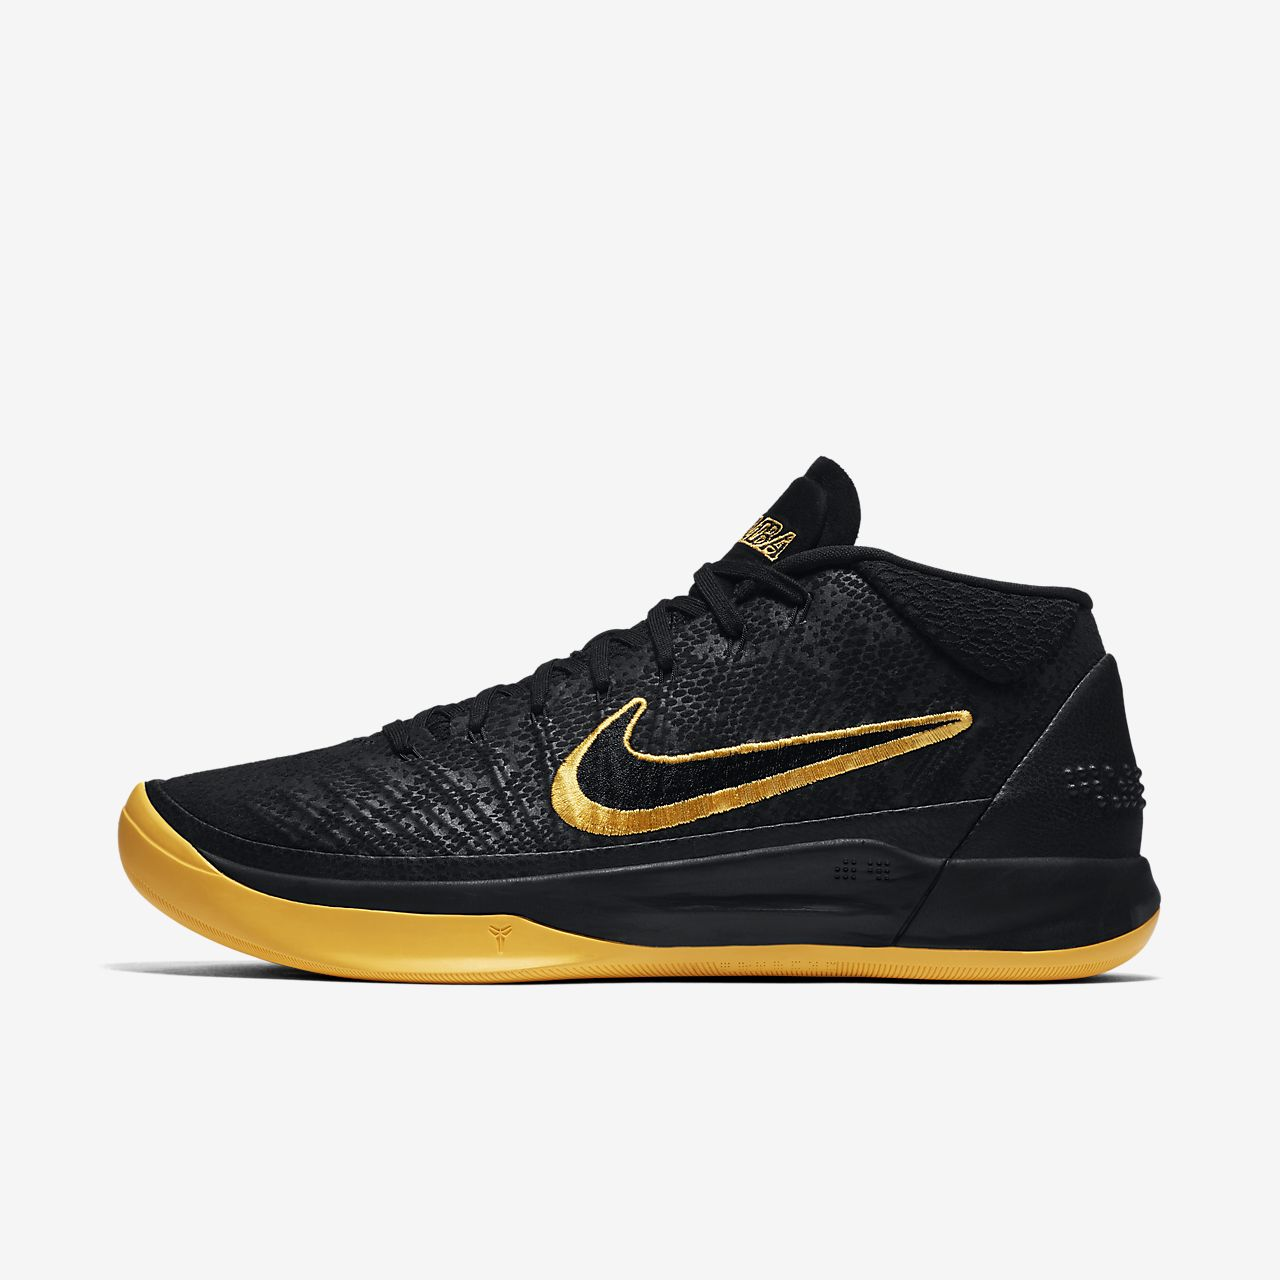 Schwarz Schuhe Nike Kobe A.d. Mamba Gold Herren Basketball